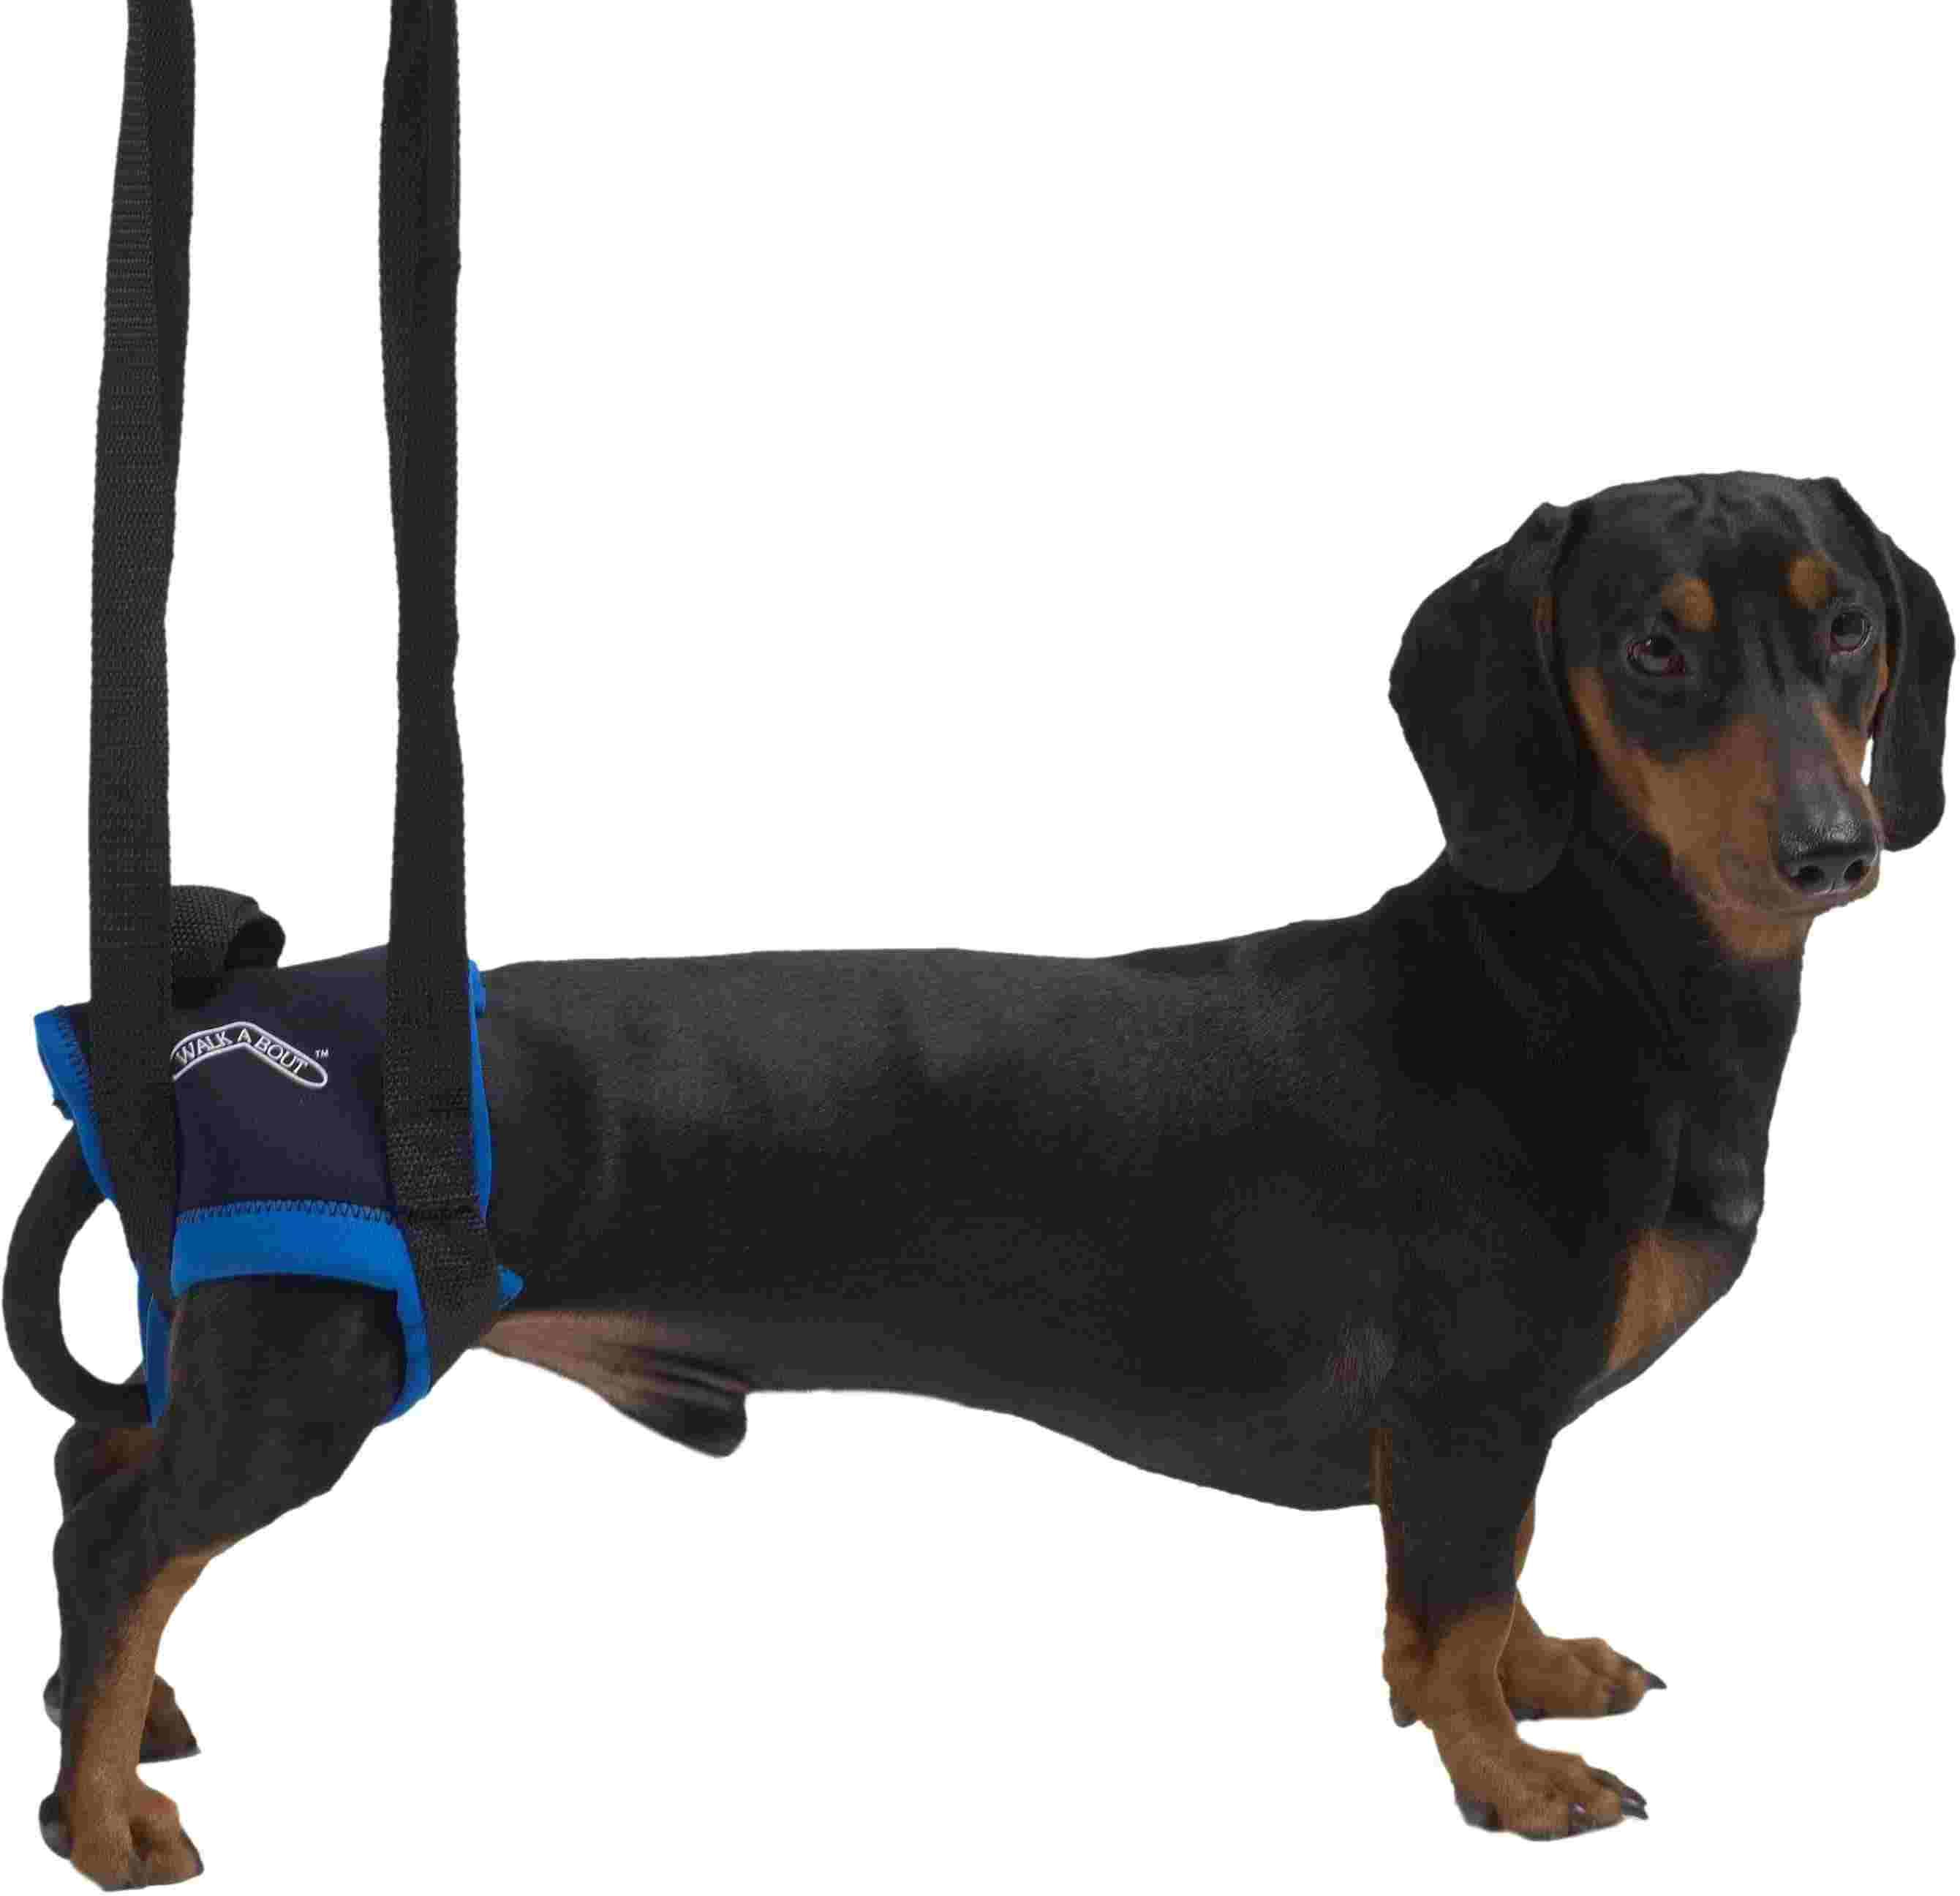 Вожжи для животных Kruuse Walkabout Harness